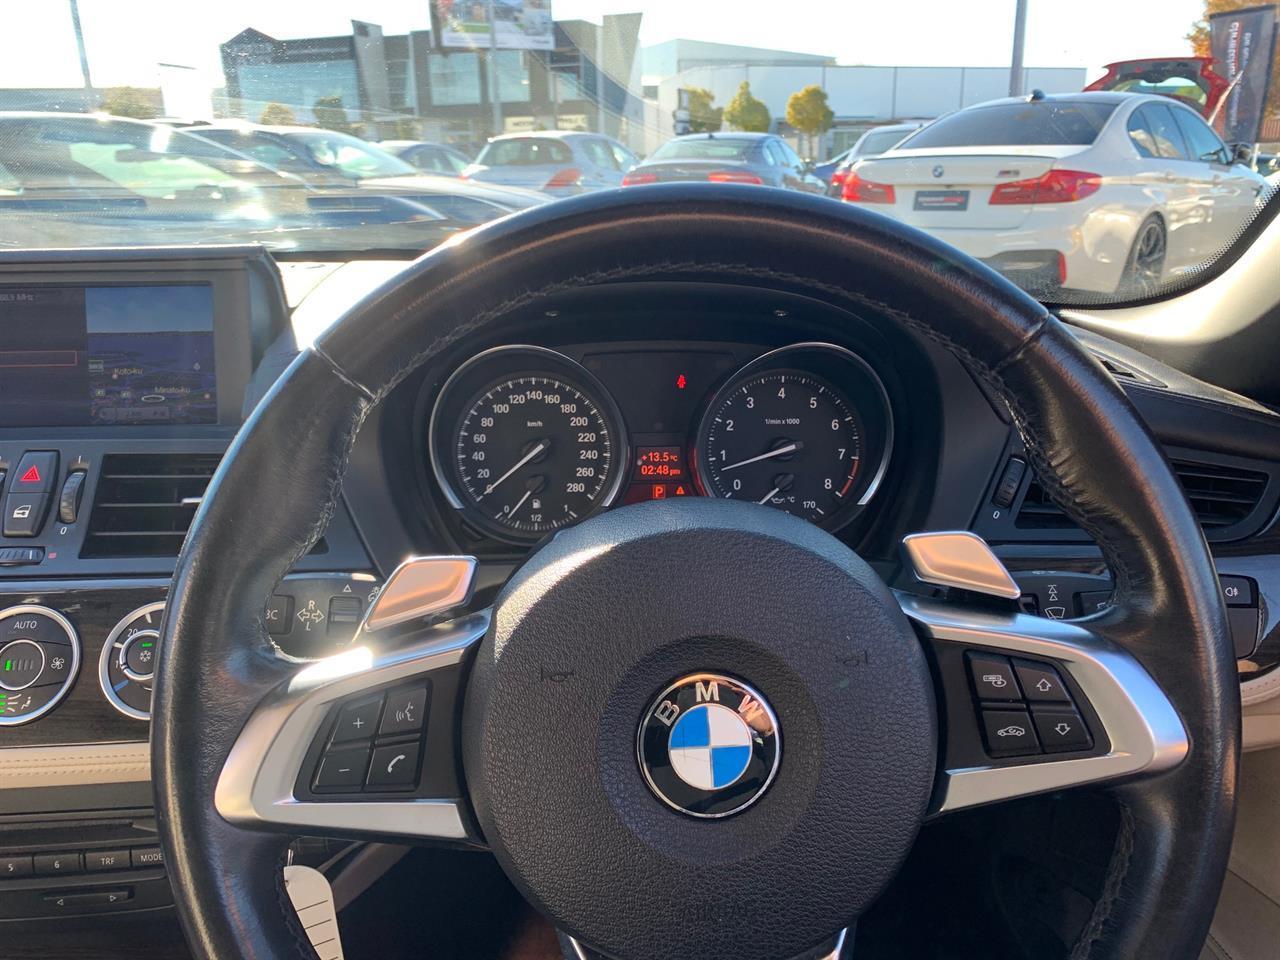 image-8, 2009 BMW Z4 SDrive Hardtop New Shape Convertible at Christchurch